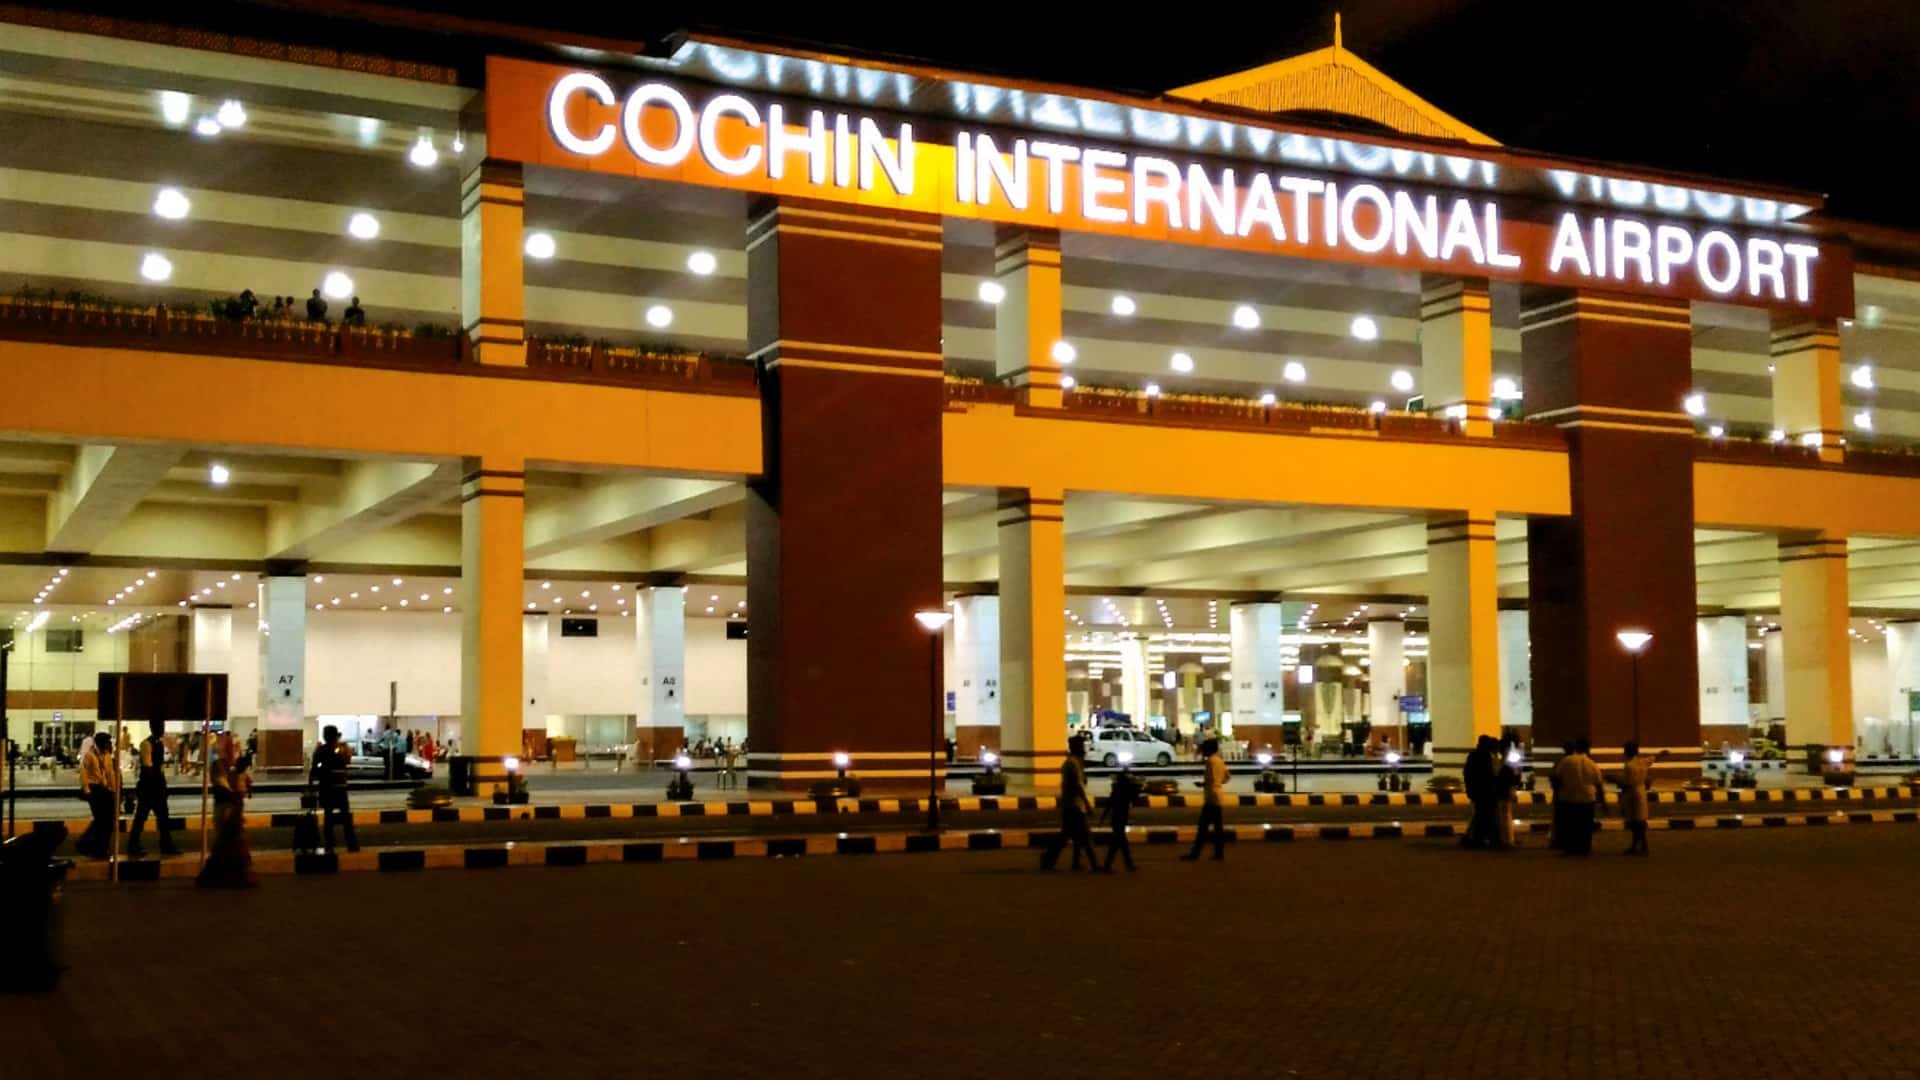 Cochin International Airport won honour in airport service quality | கொச்சின் சர்வதேச விமான நிலையம் விமான நிலைய சேவை தரத்தில் கௌரவத்தை பெற்றது |_40.1